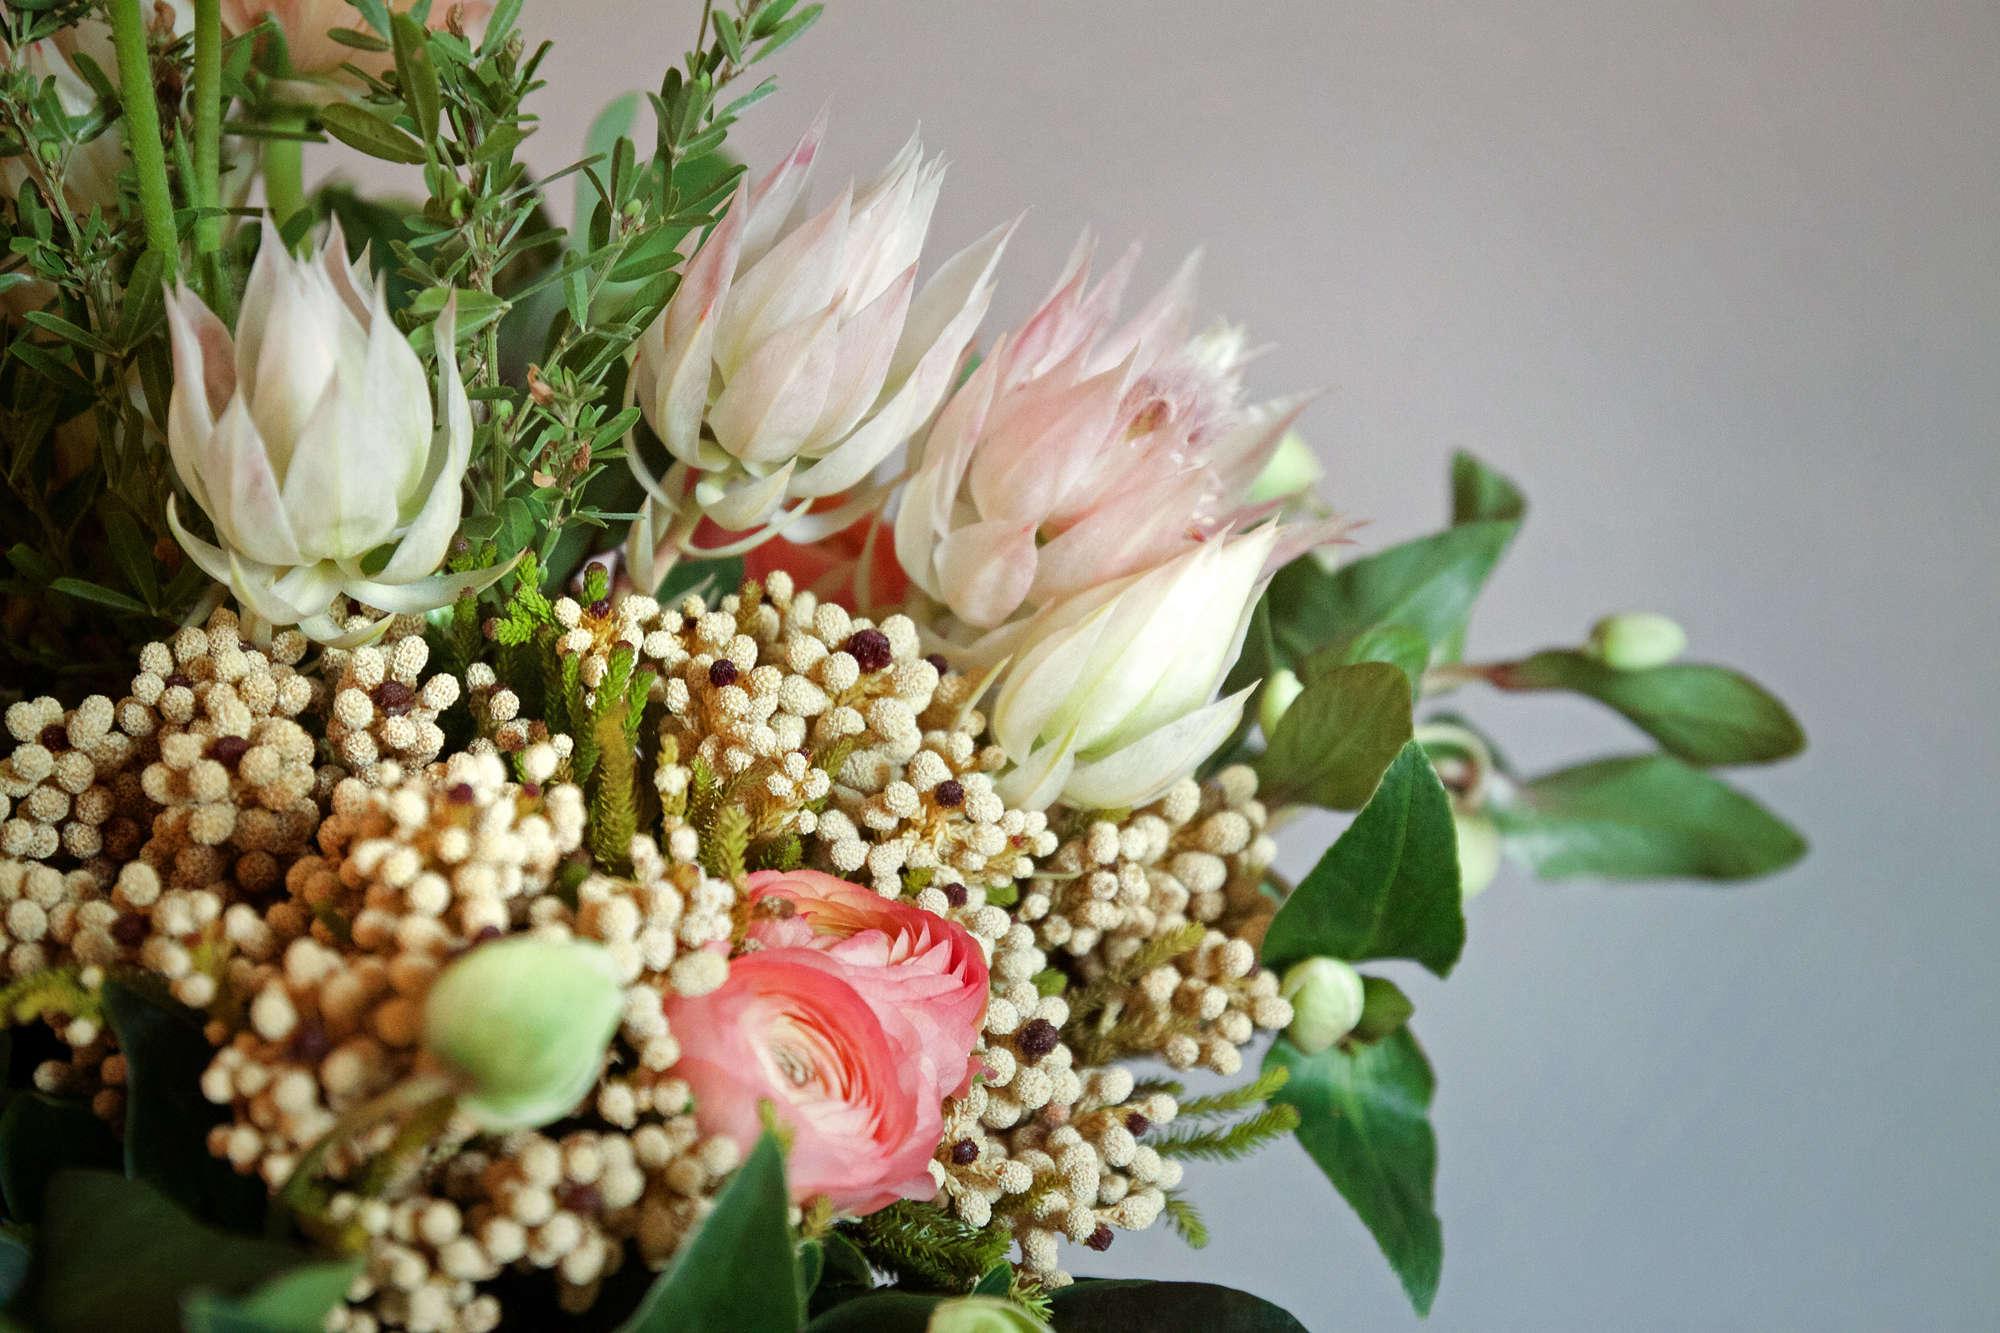 NYC Flower Market: 5 Floral Arrangements for $200 - Gardenista